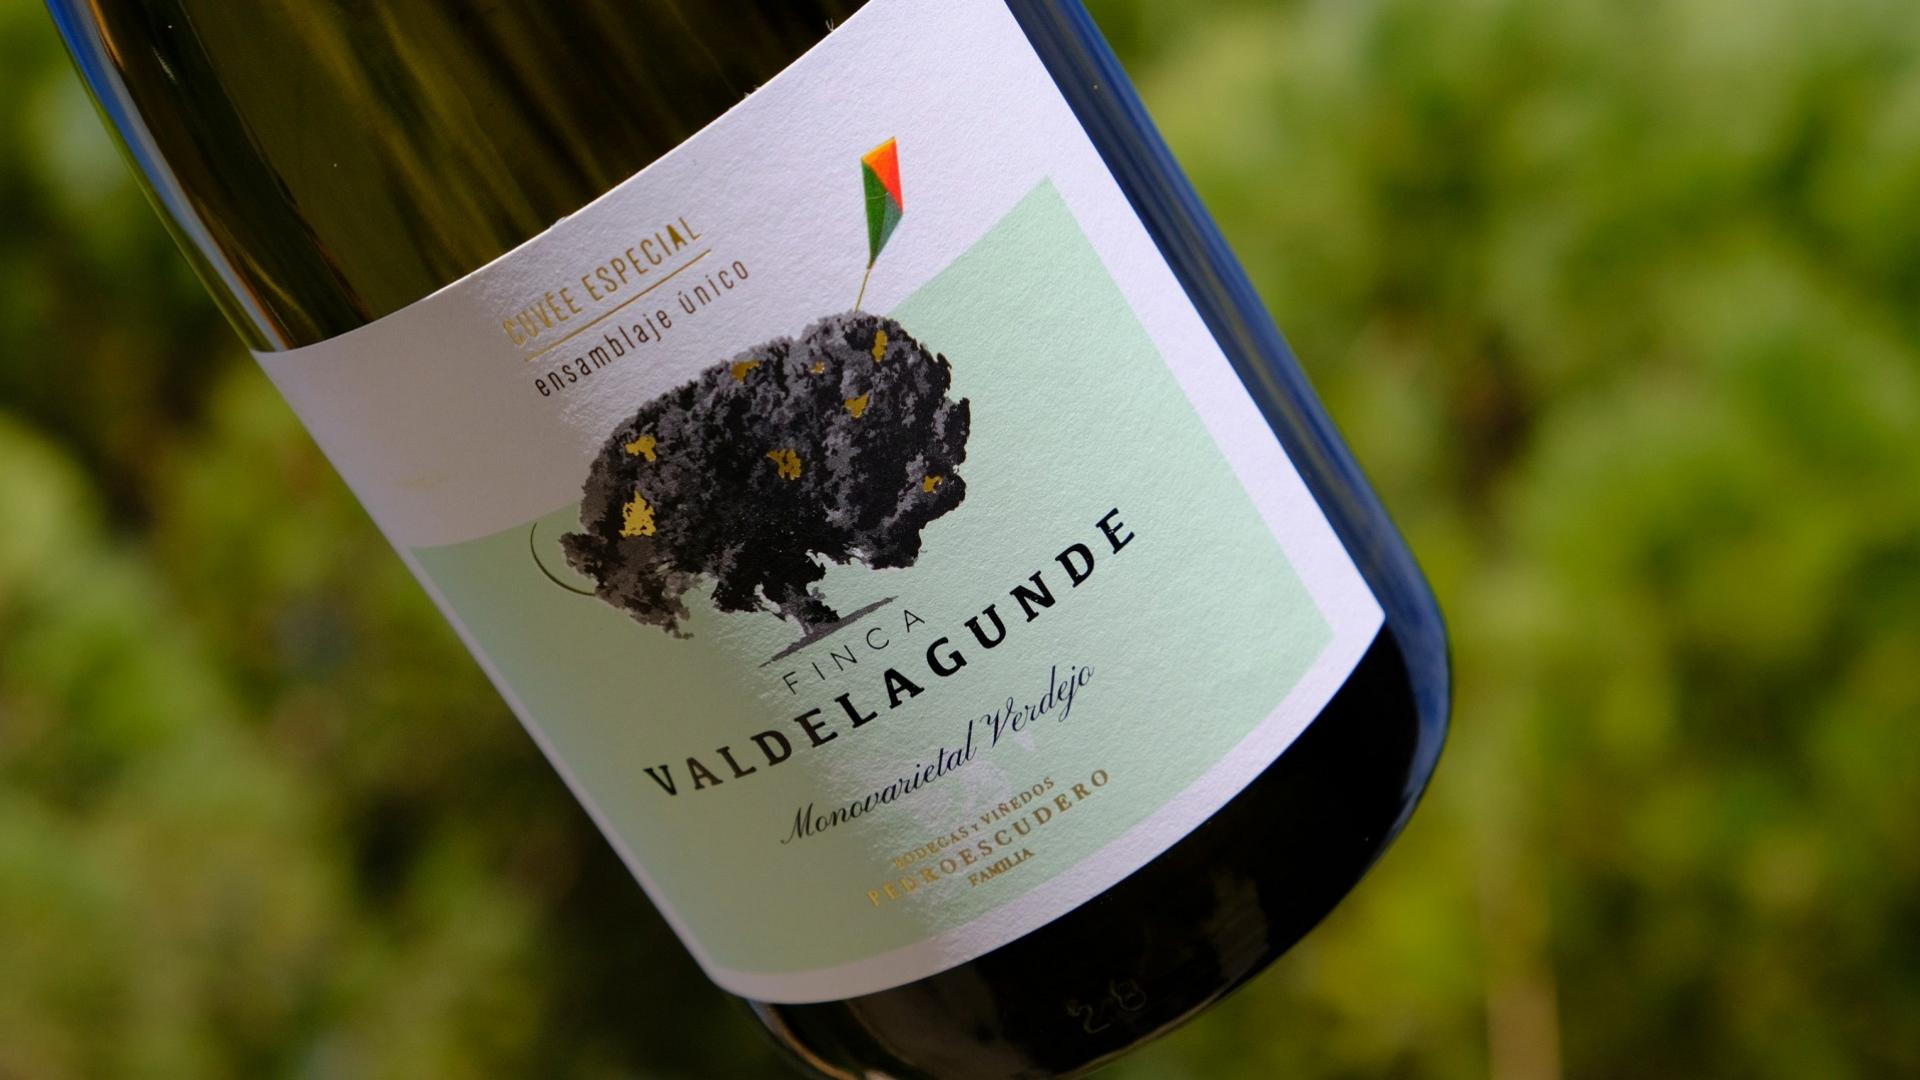 Finca Valdeagunde Cuvée especial 2020 is now available